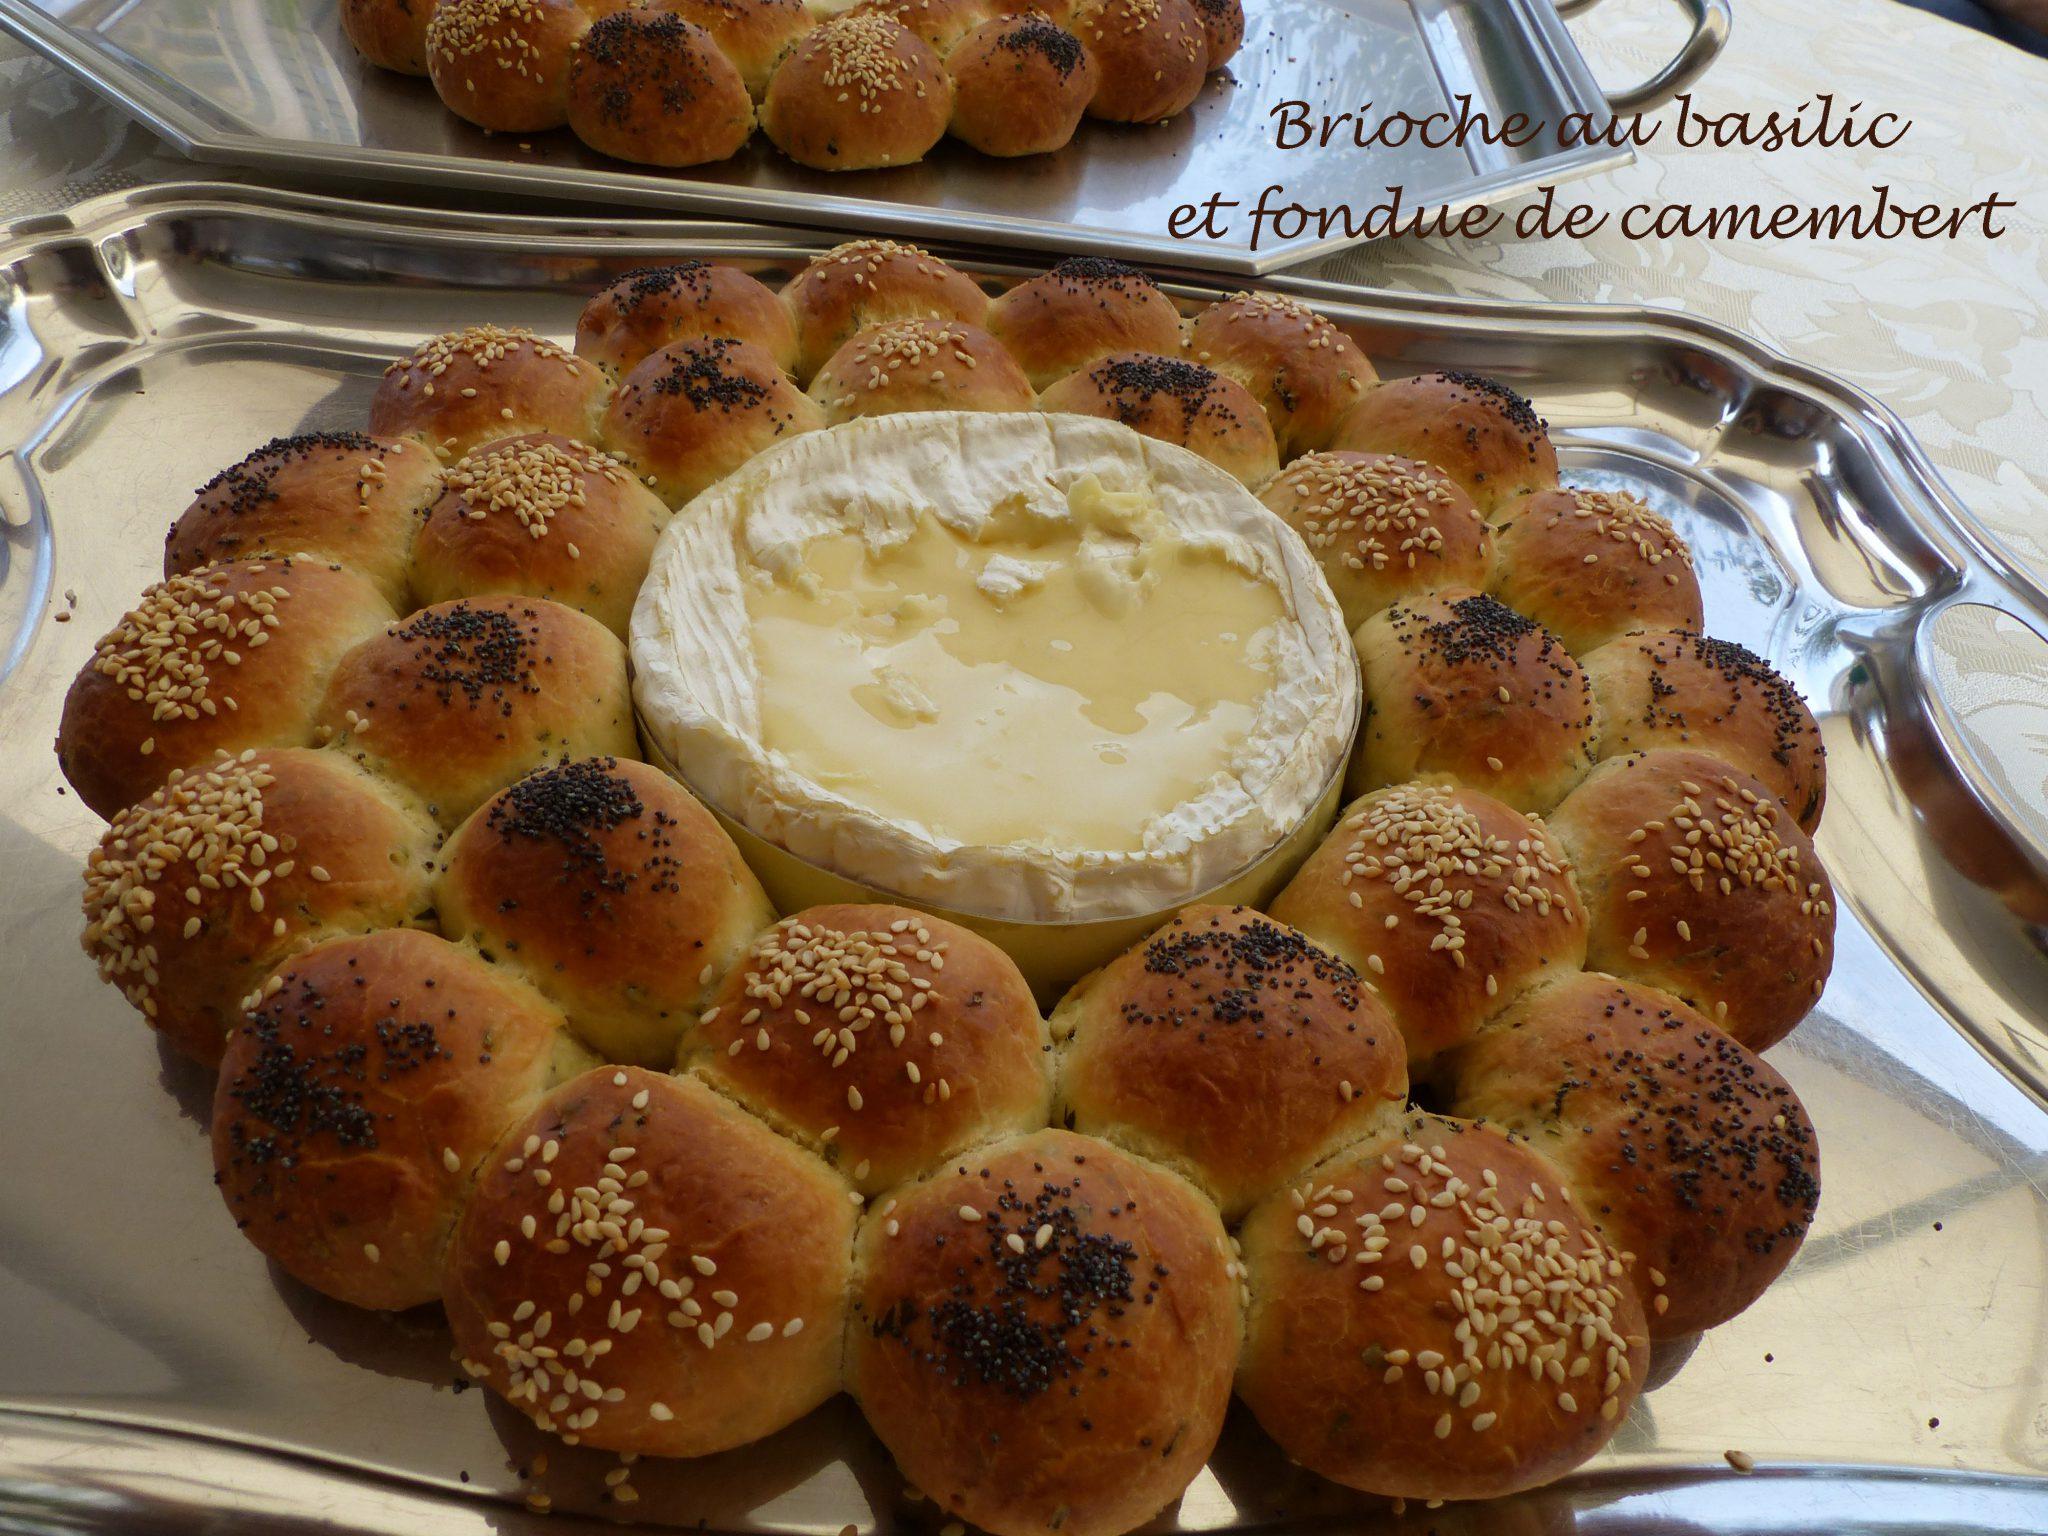 Brioche au basilic et fondue de camembert P1130154 R